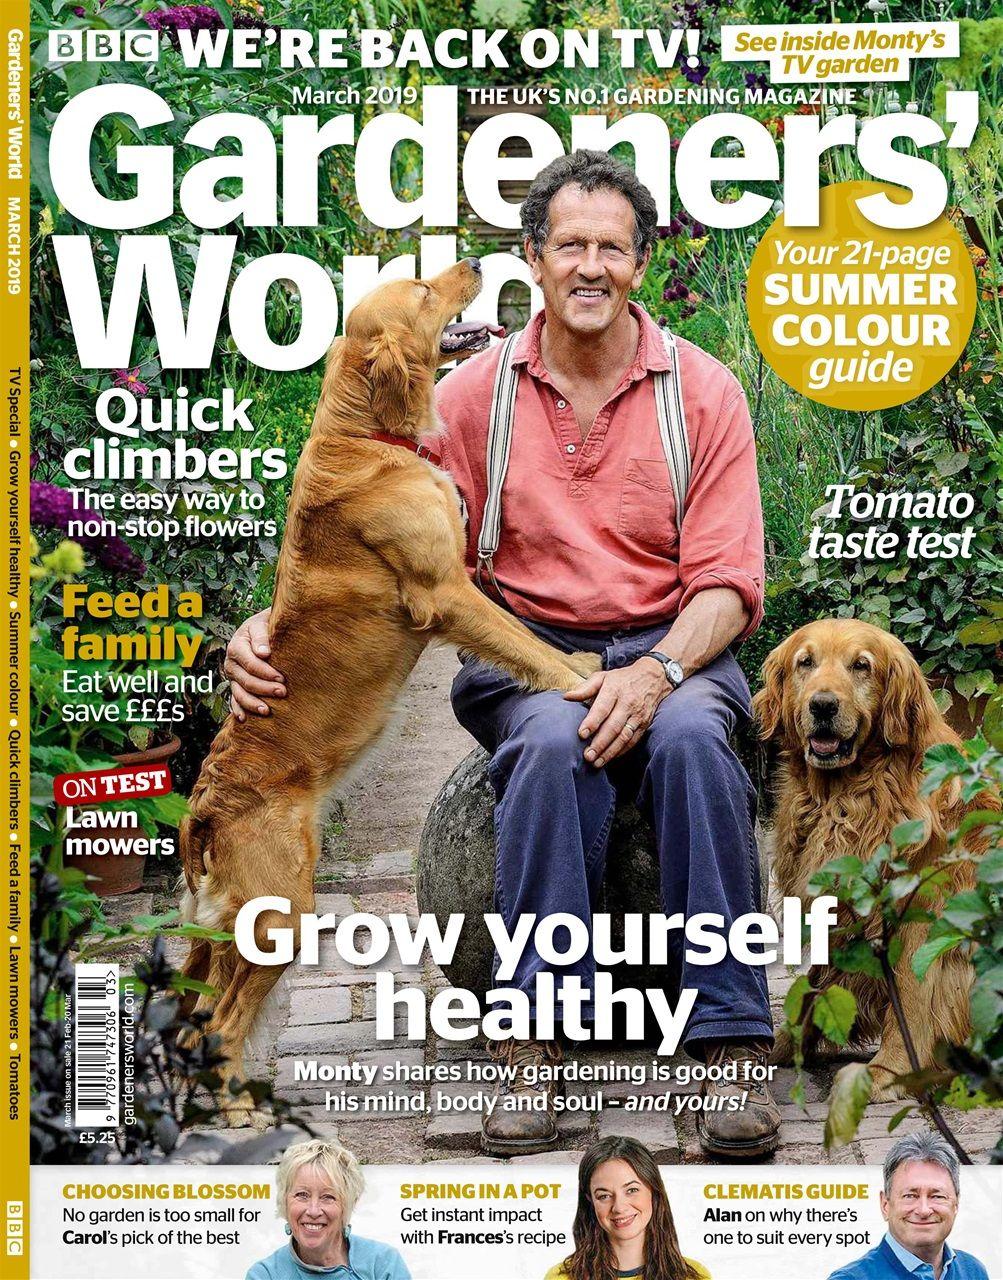 474142ca5b494f9b2cfb2960d418b148 - Back Issues Of Gardeners World Magazine